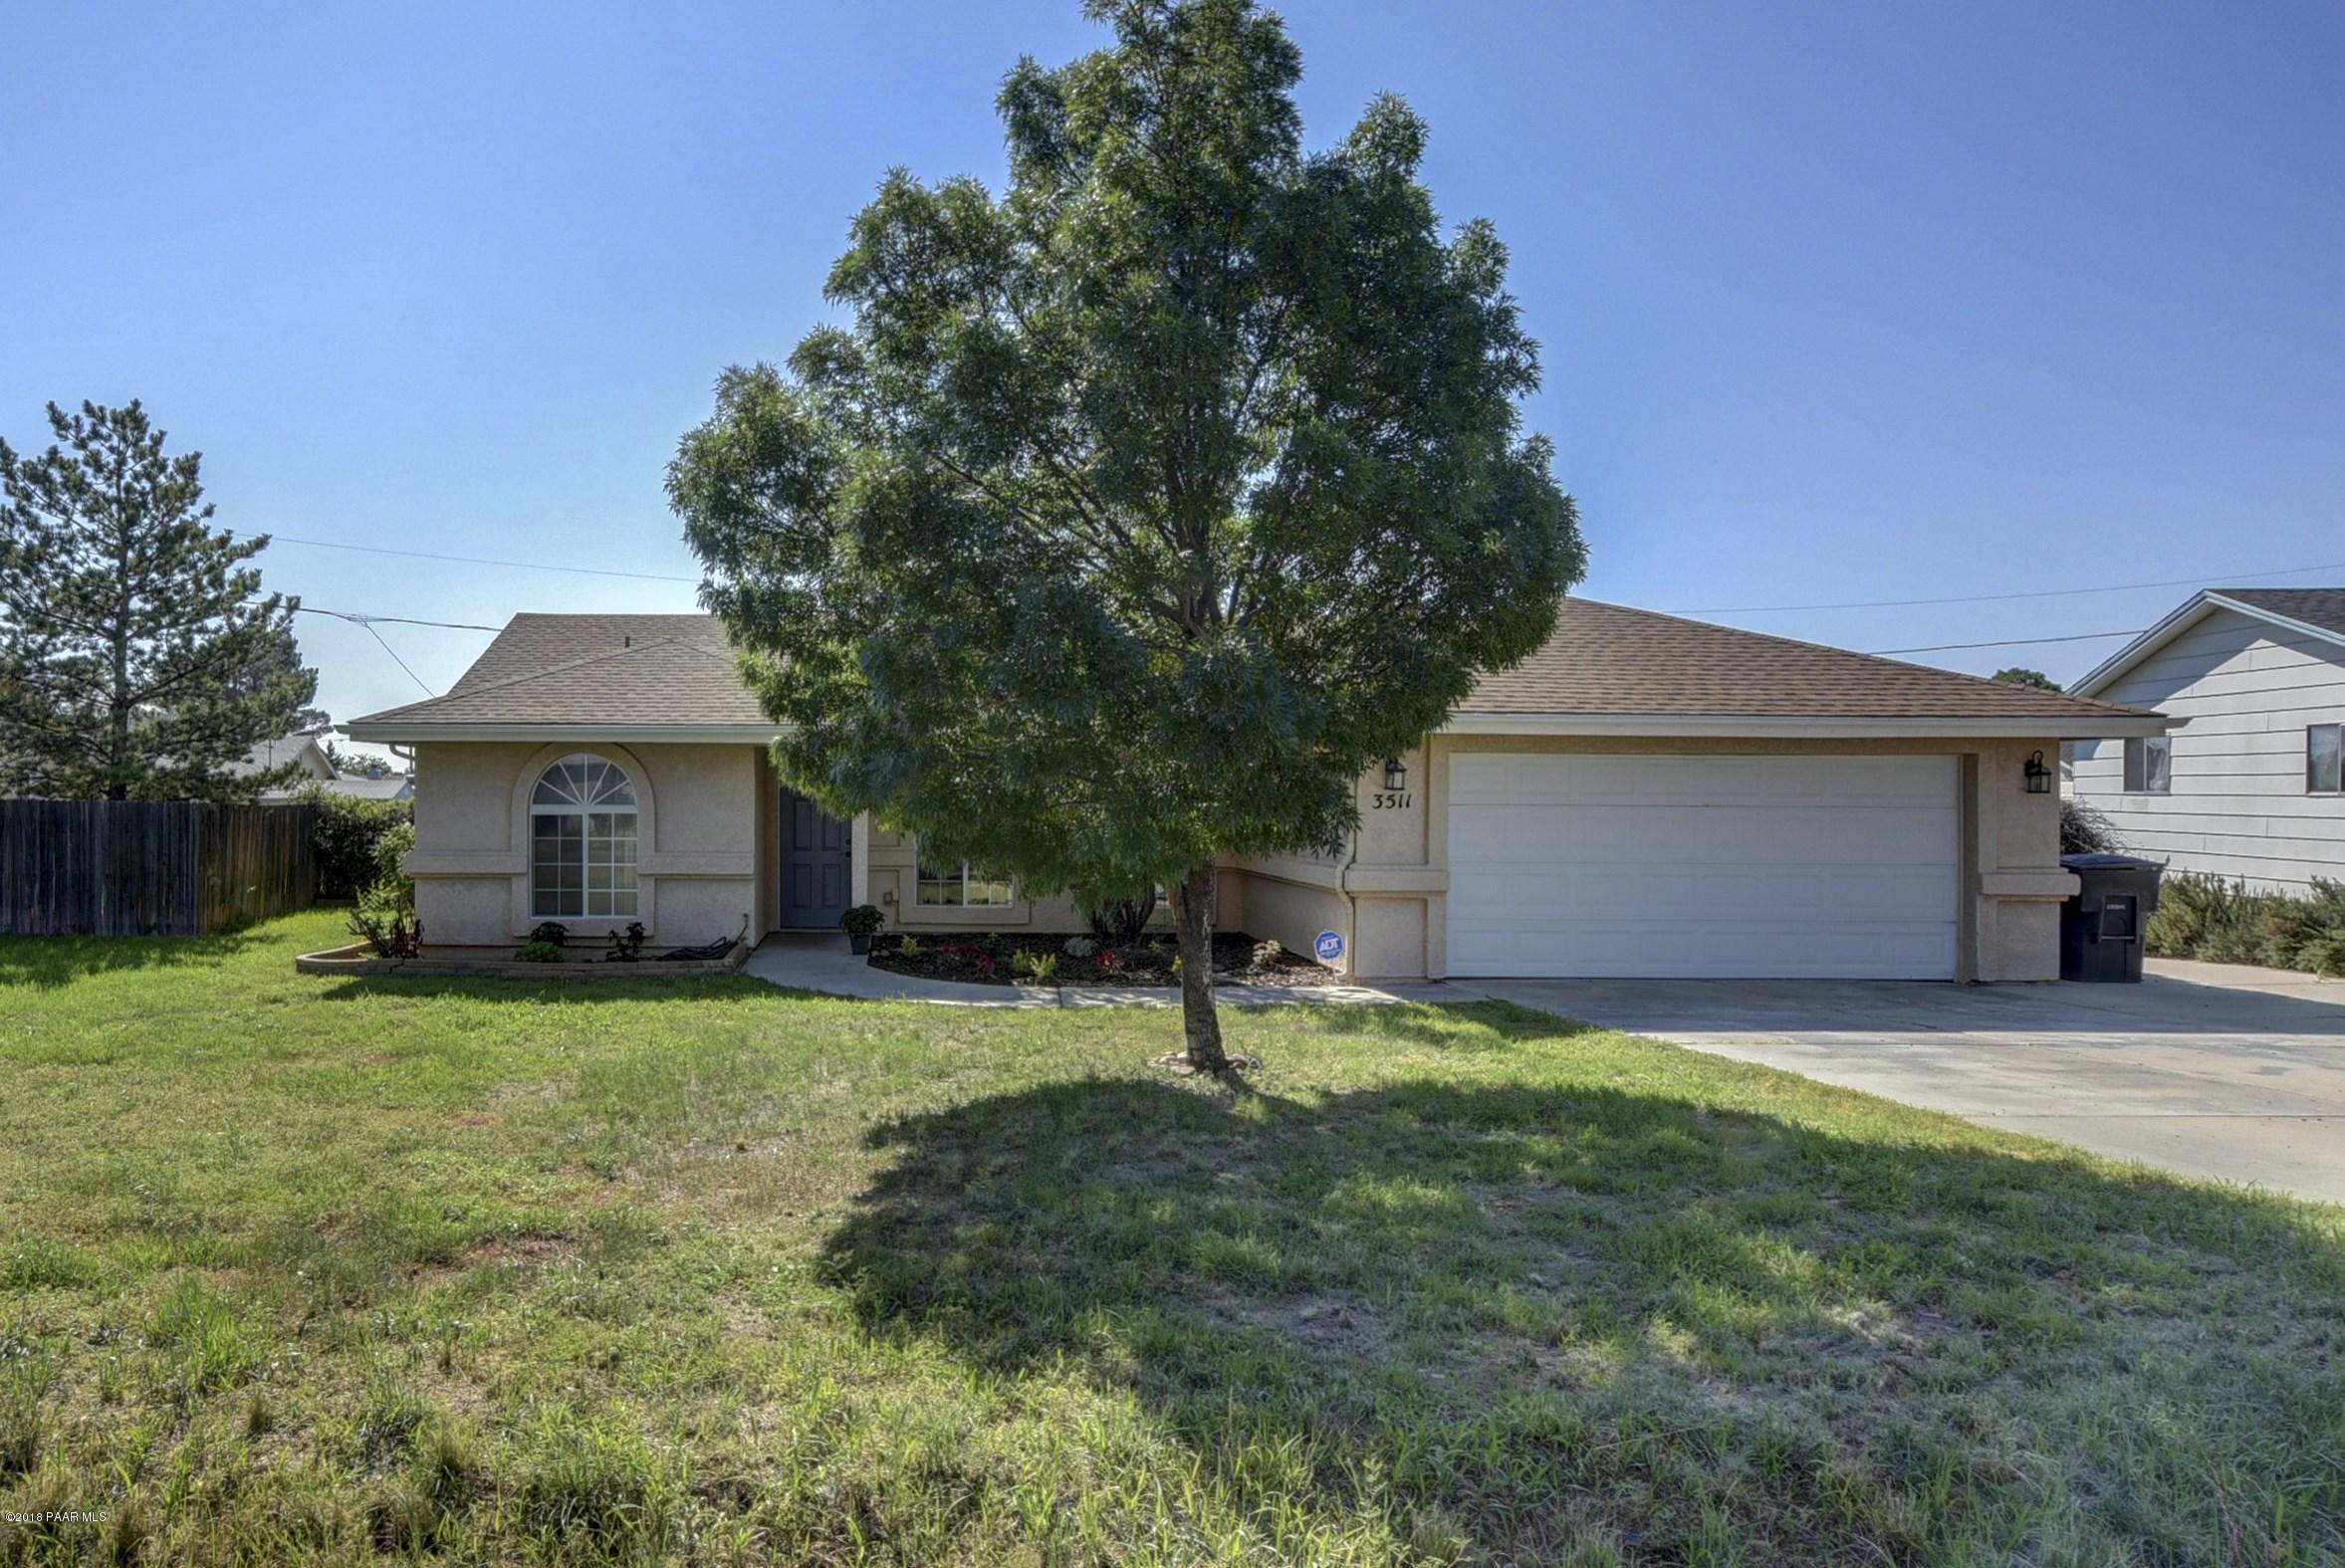 3511 N Sharon Drive Prescott Valley, AZ 86314 - MLS #: 1014492